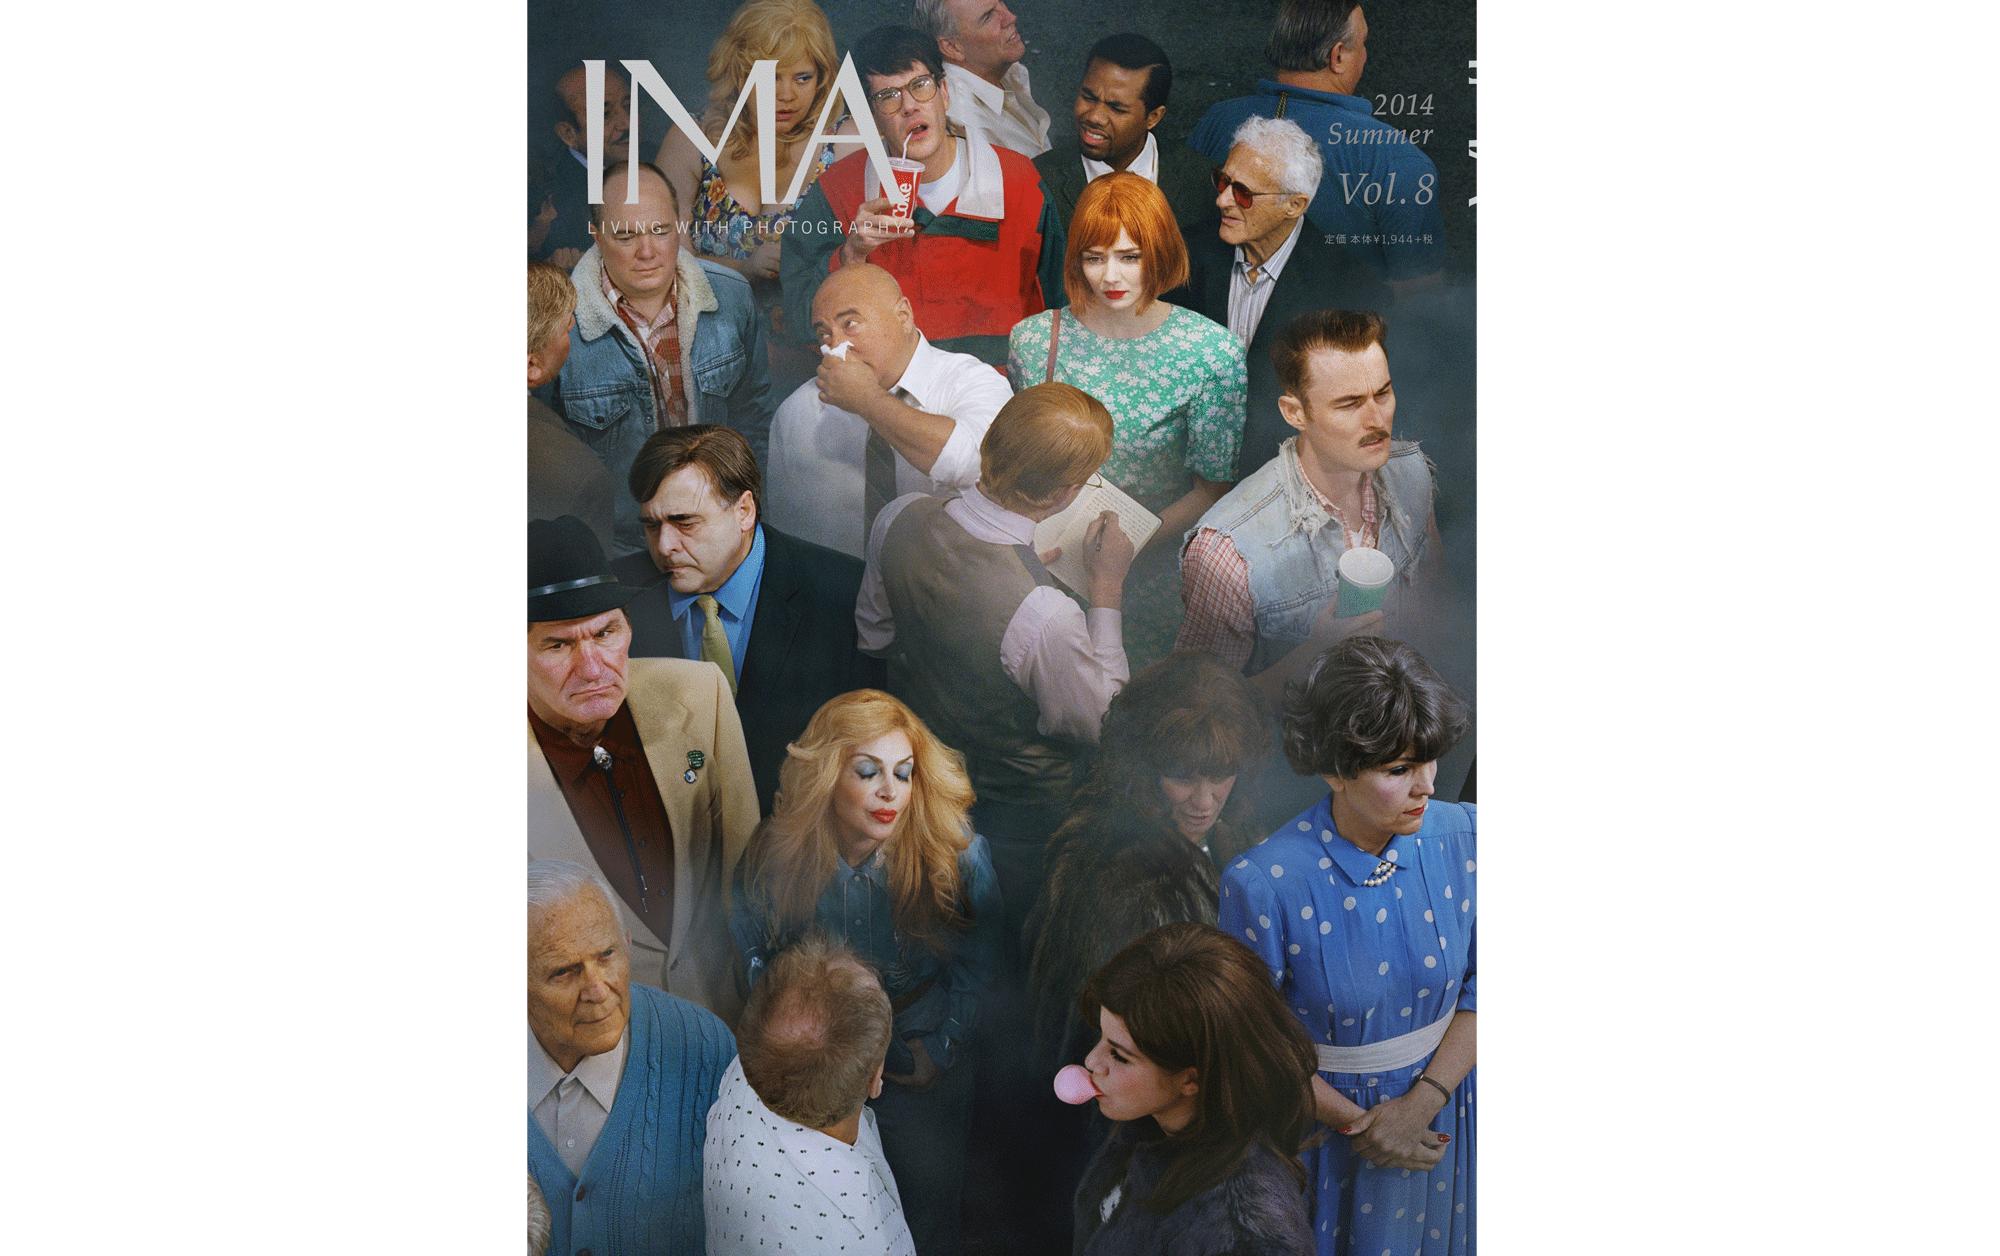 IMA 2014 Summer Vol.8